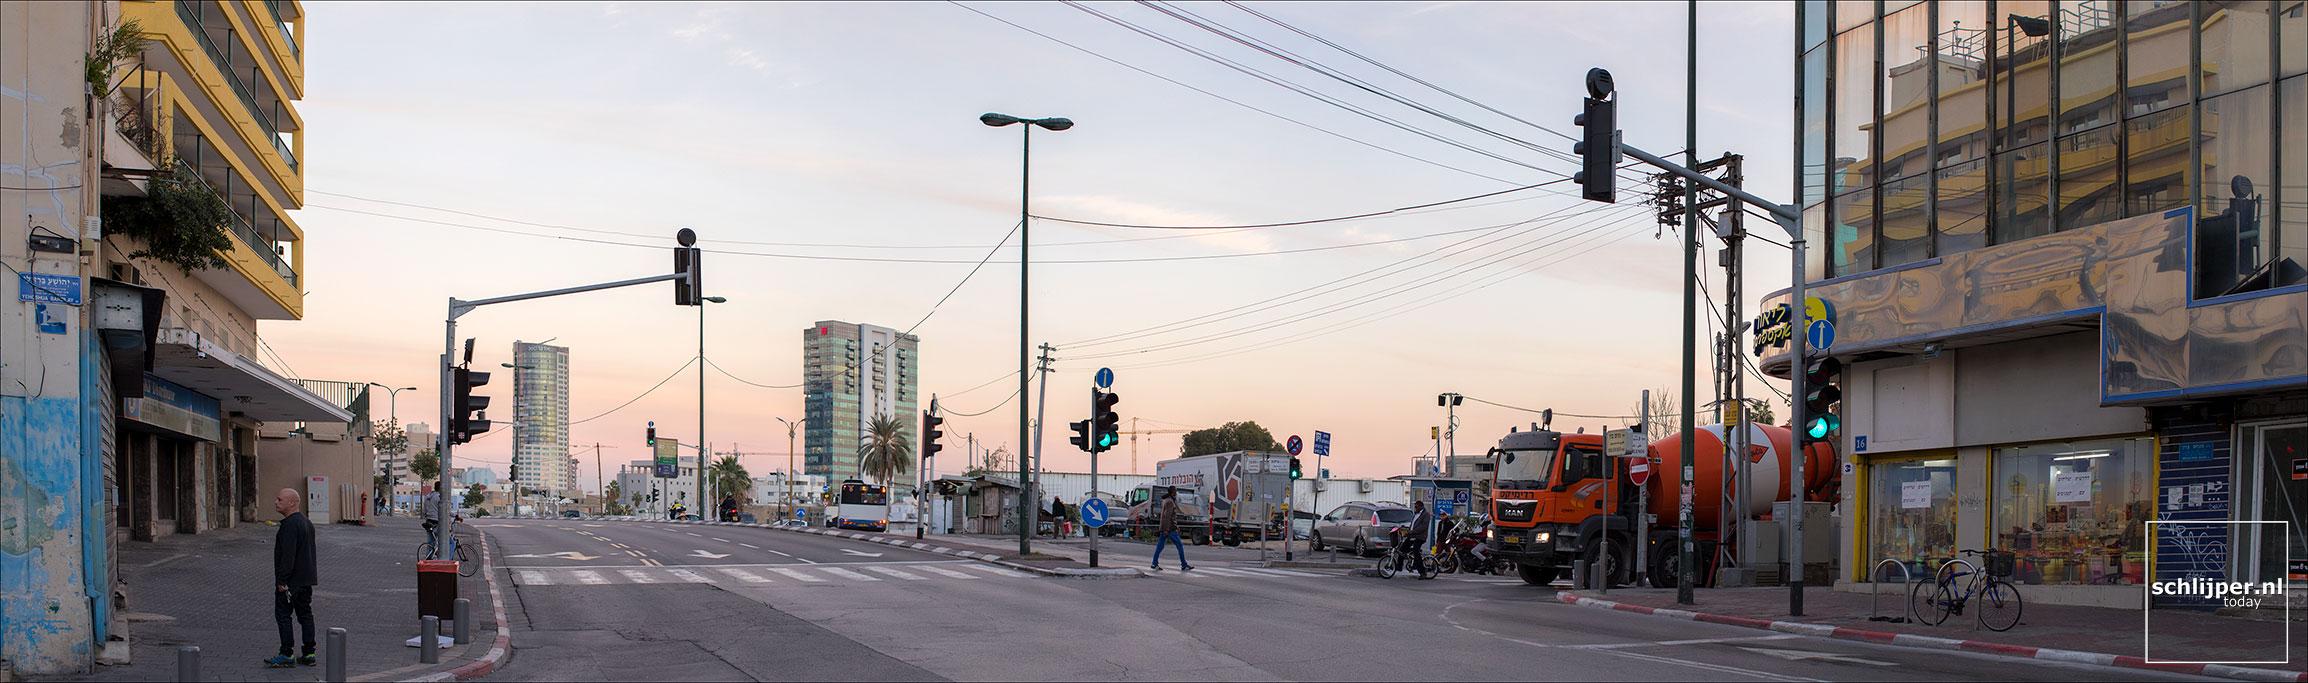 Israel, Tel Aviv, 9 januari 2018